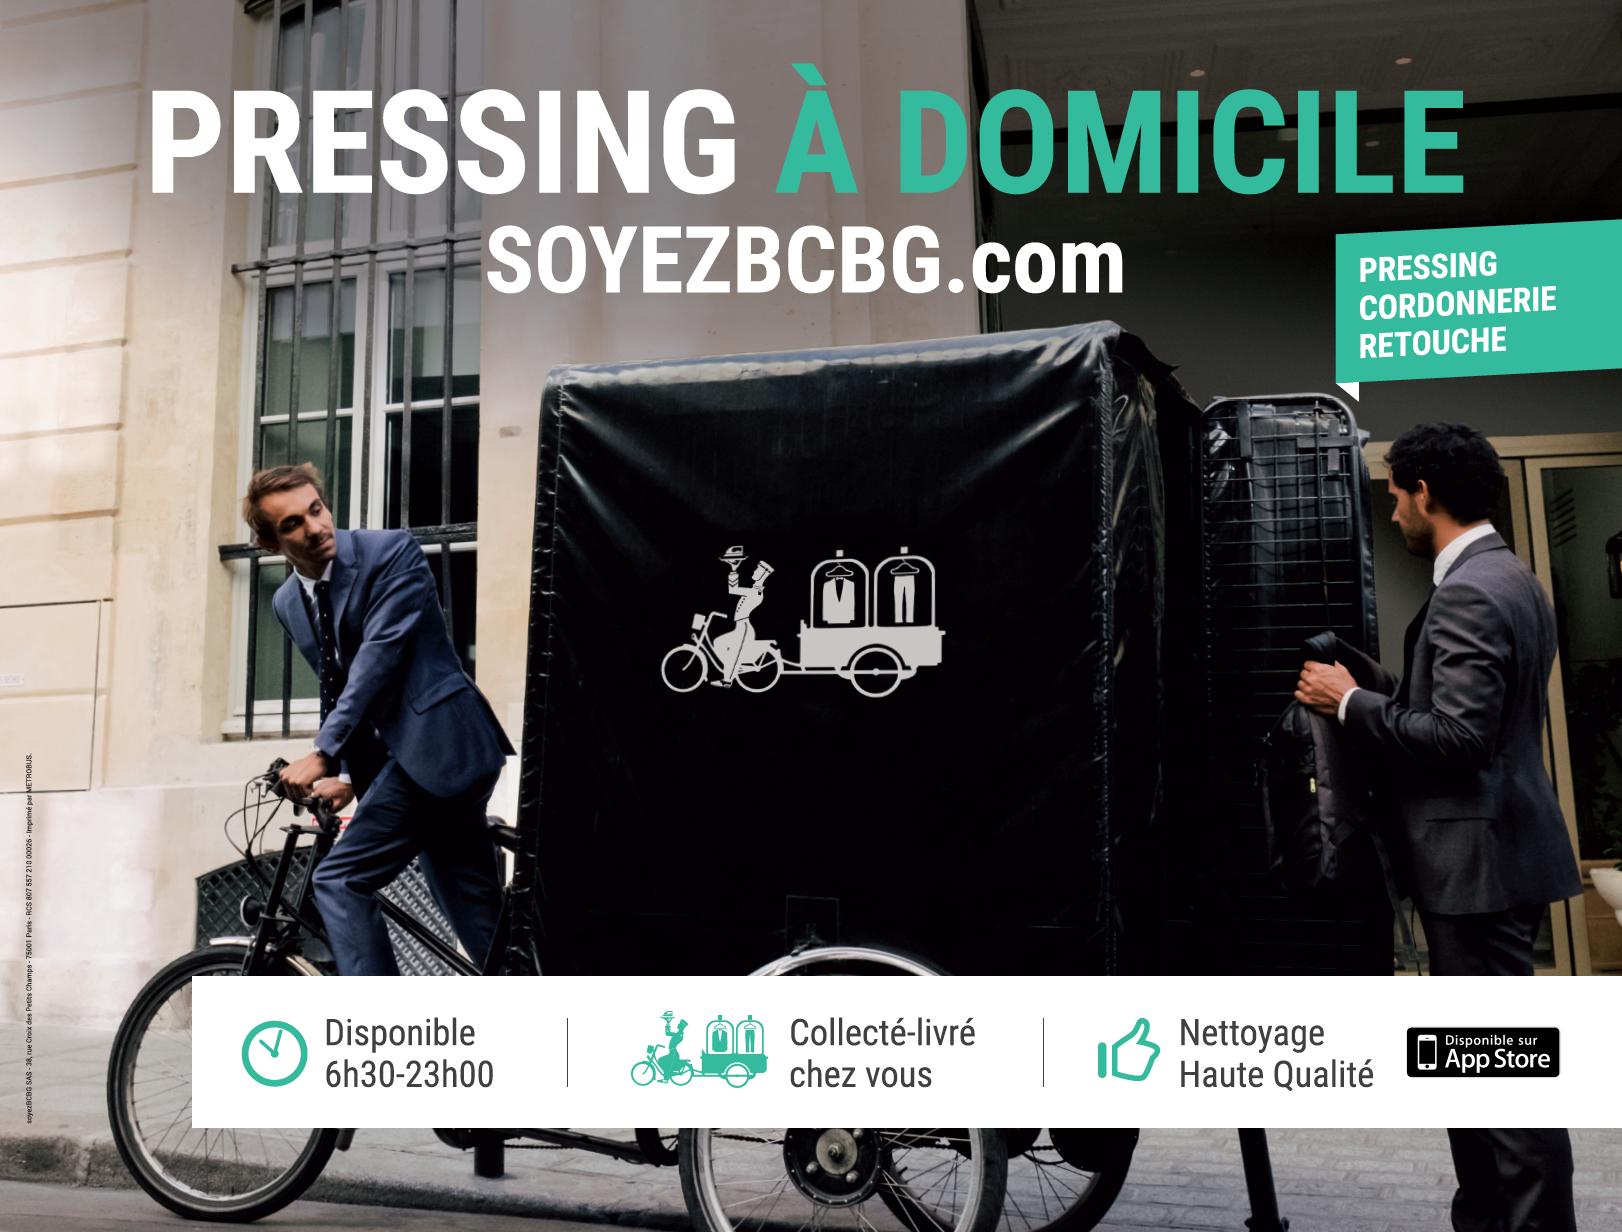 soyez-bcbg-campagne-metro-paris-studio-dstn.jpg